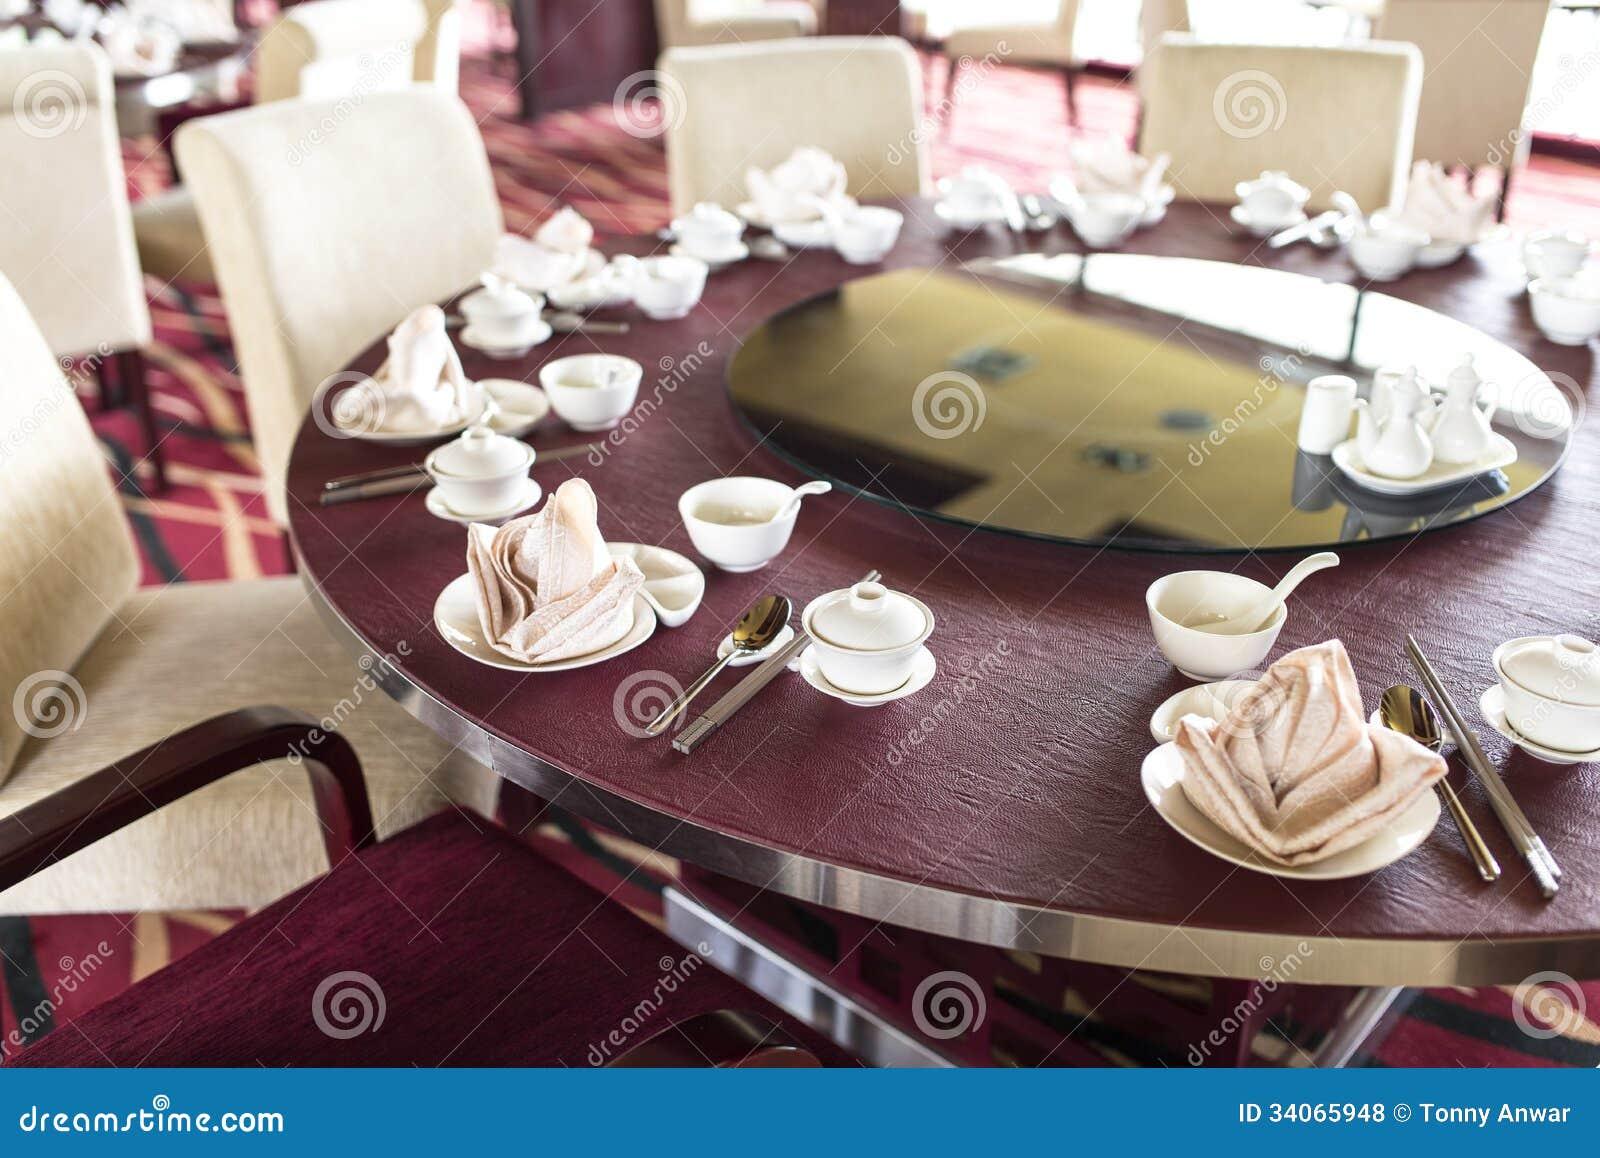 Restaurant table setup - Oriental Chinese Restaurant Royalty Free Stock Photos